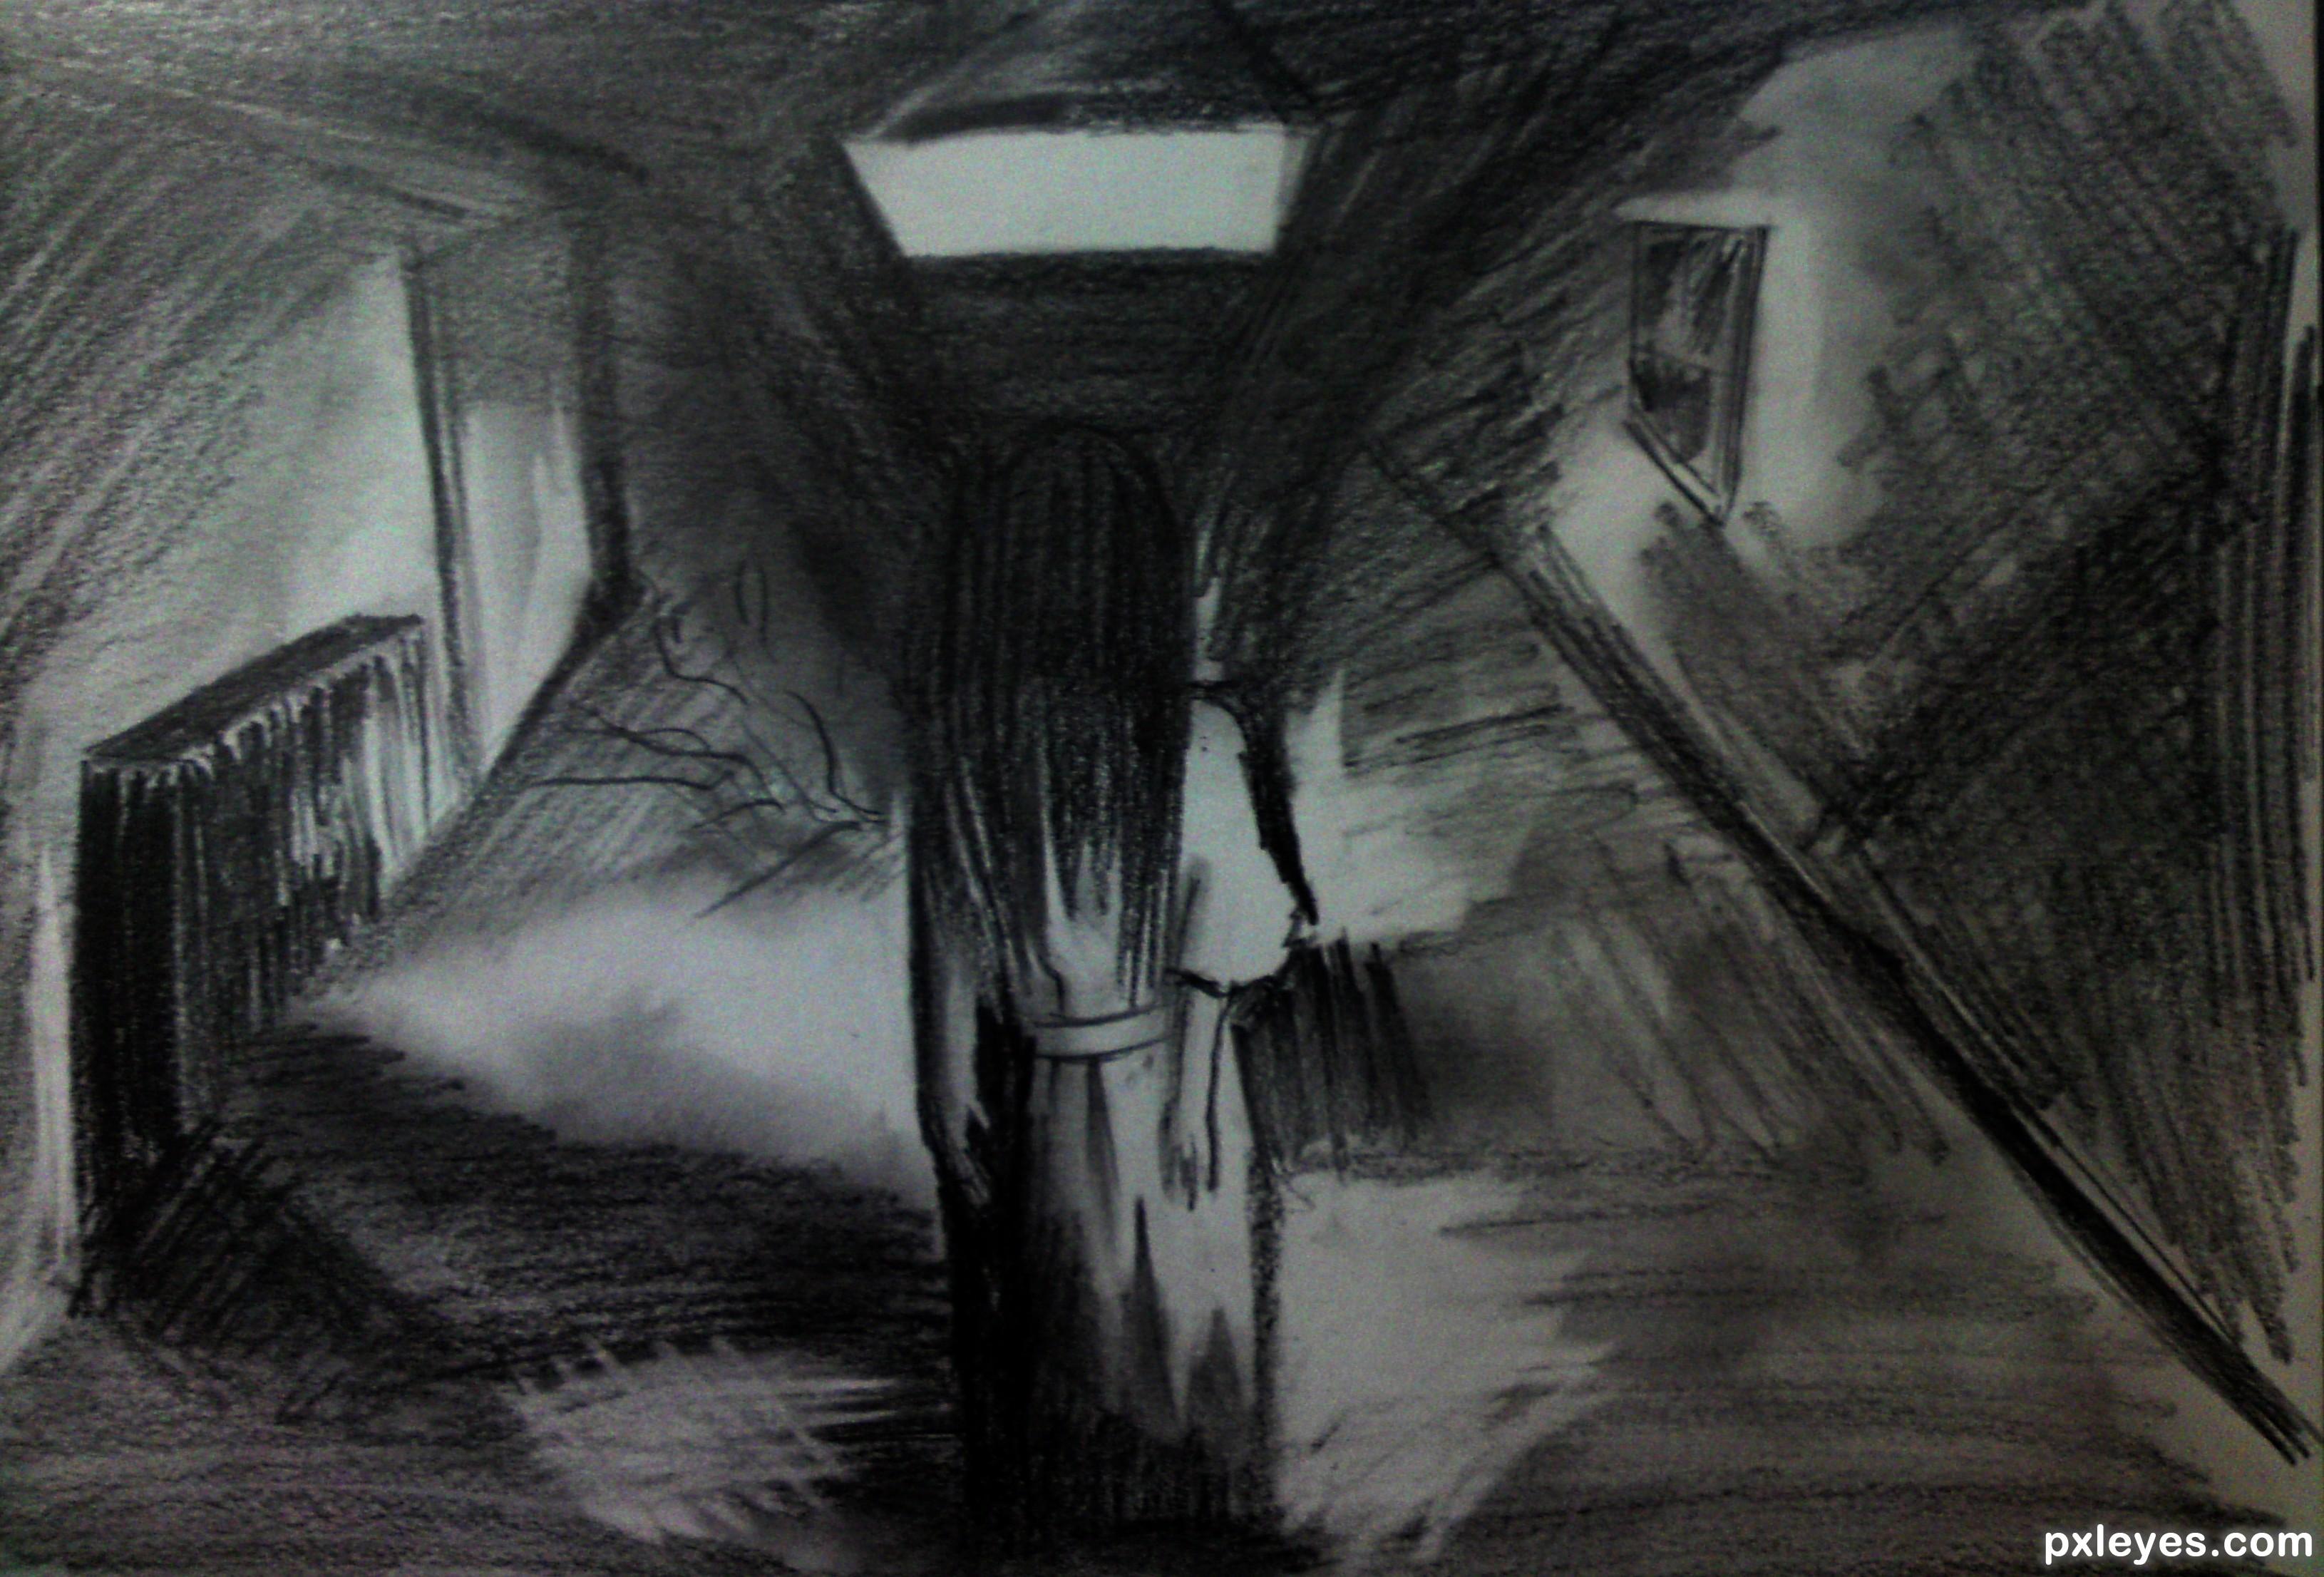 Drawn room dark room Maya91 by The created Room